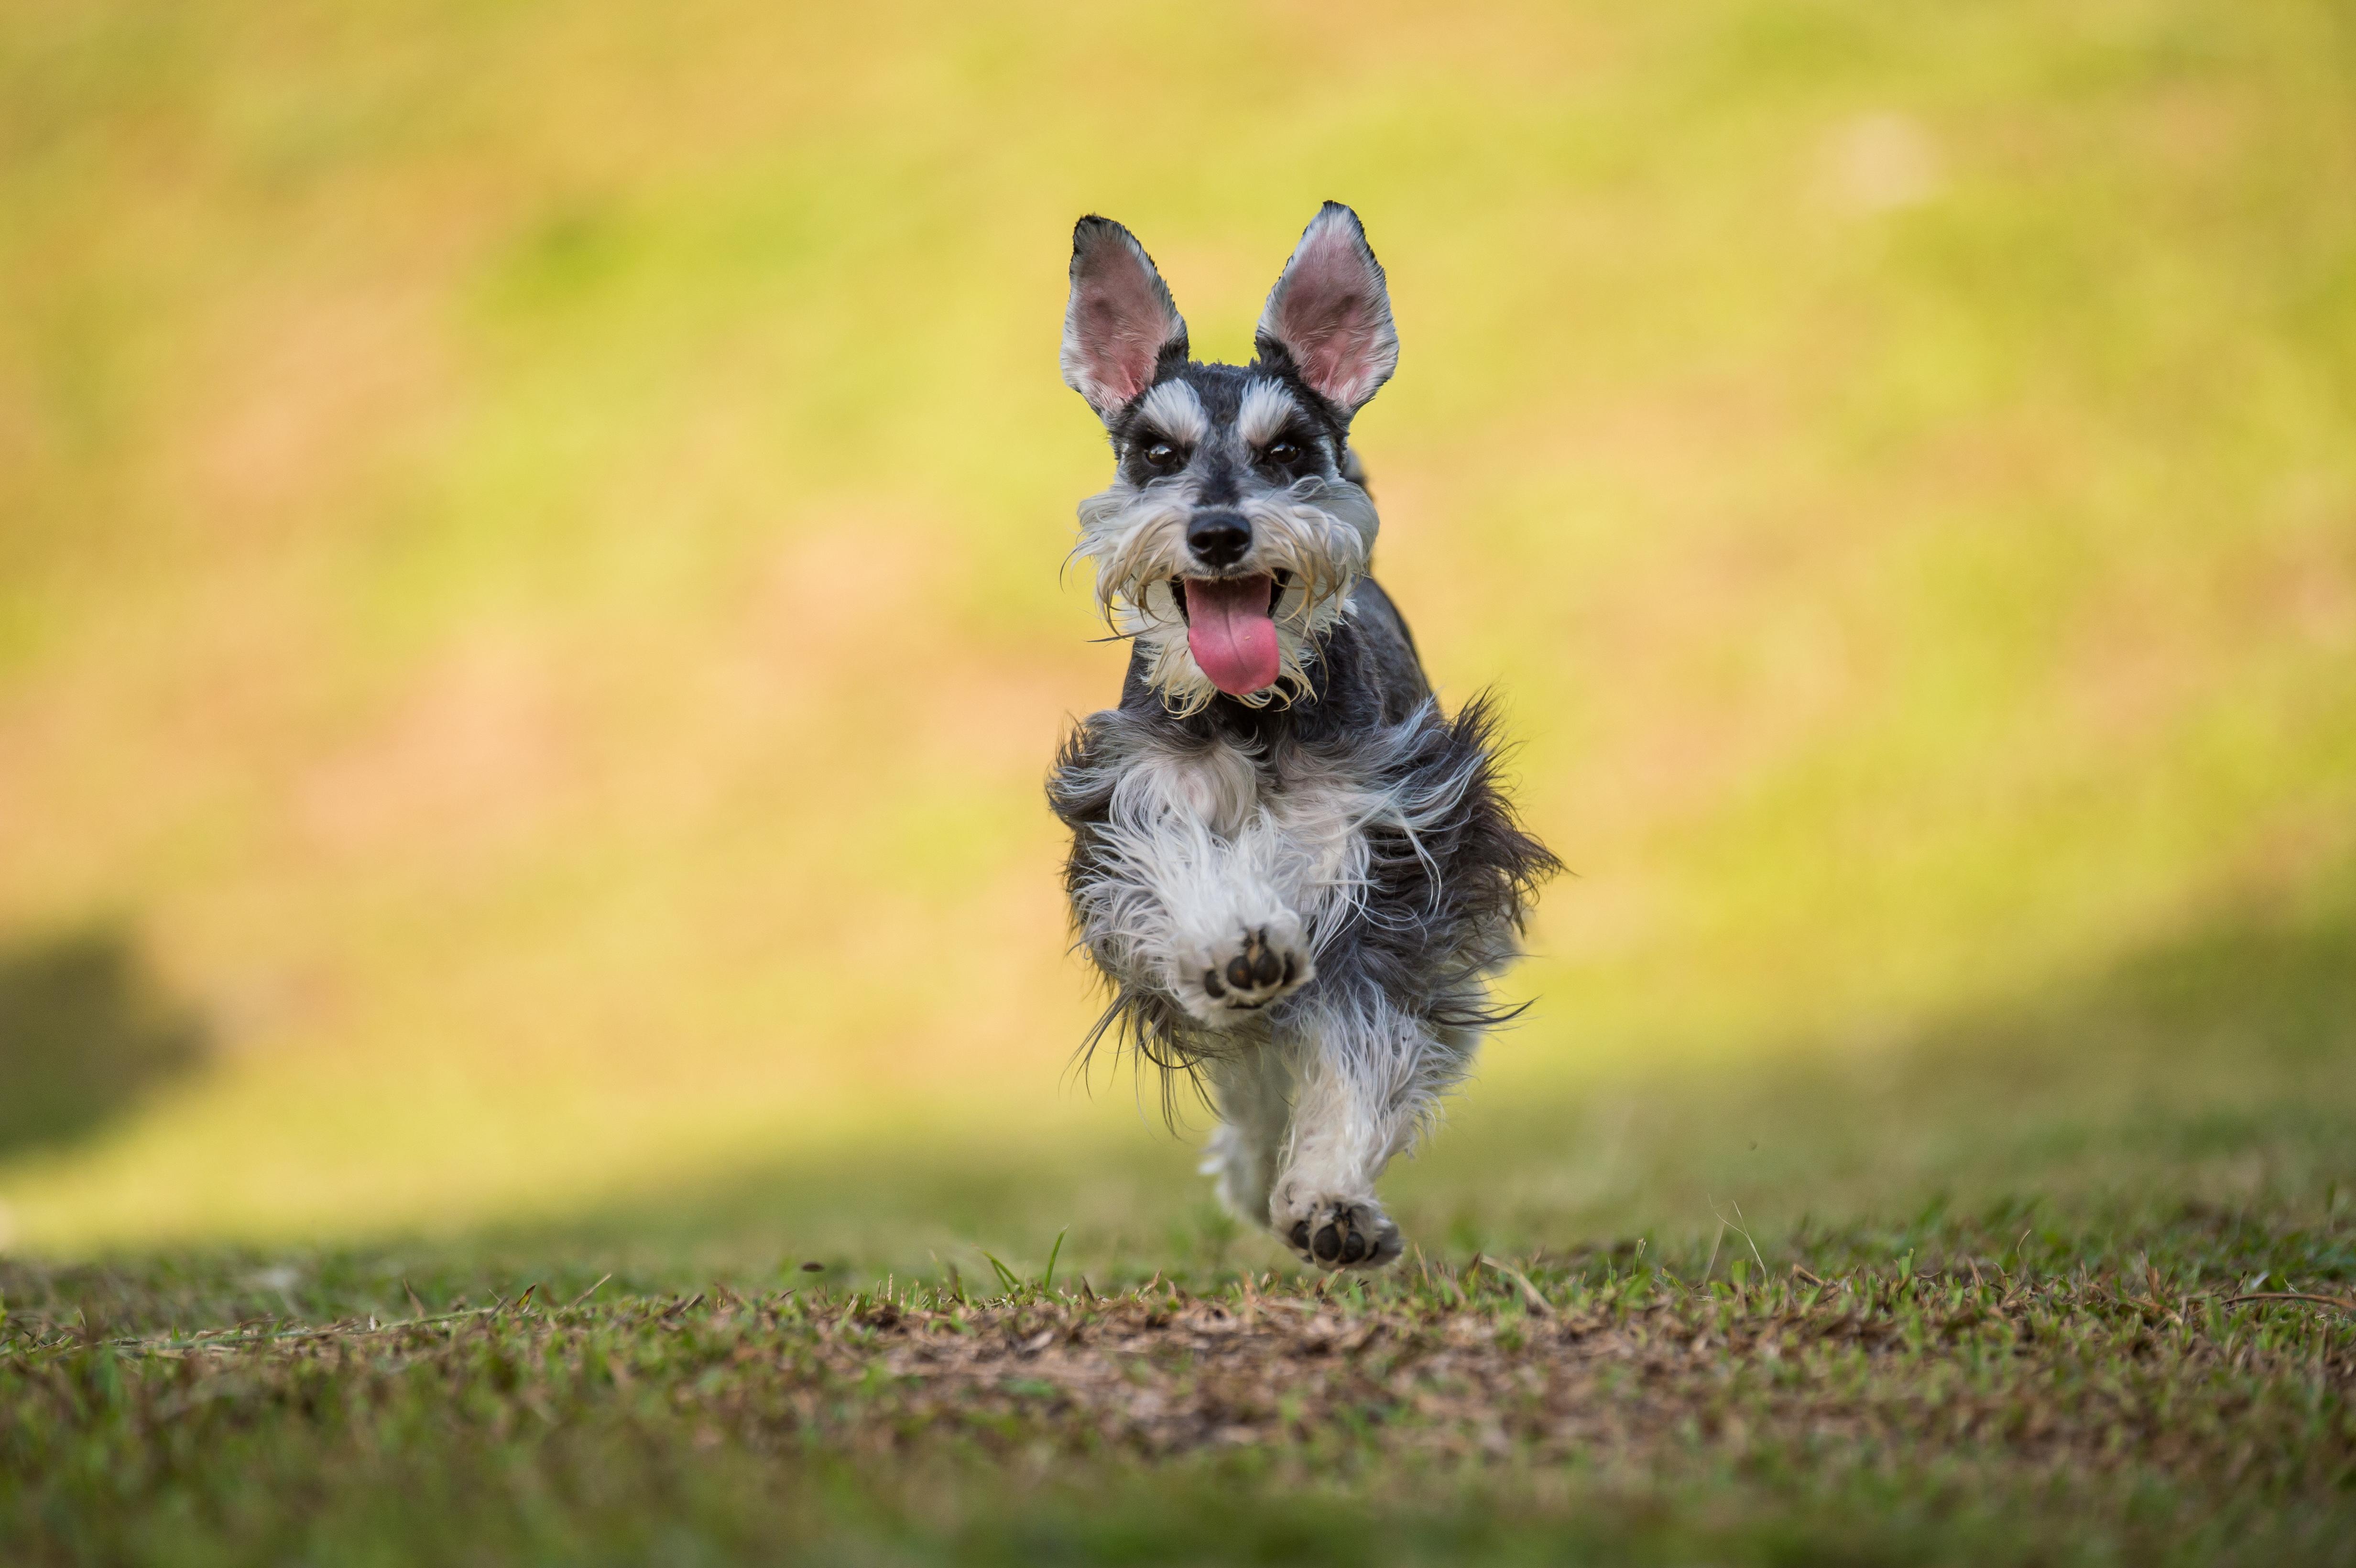 Un perro saltando - 4928x3280